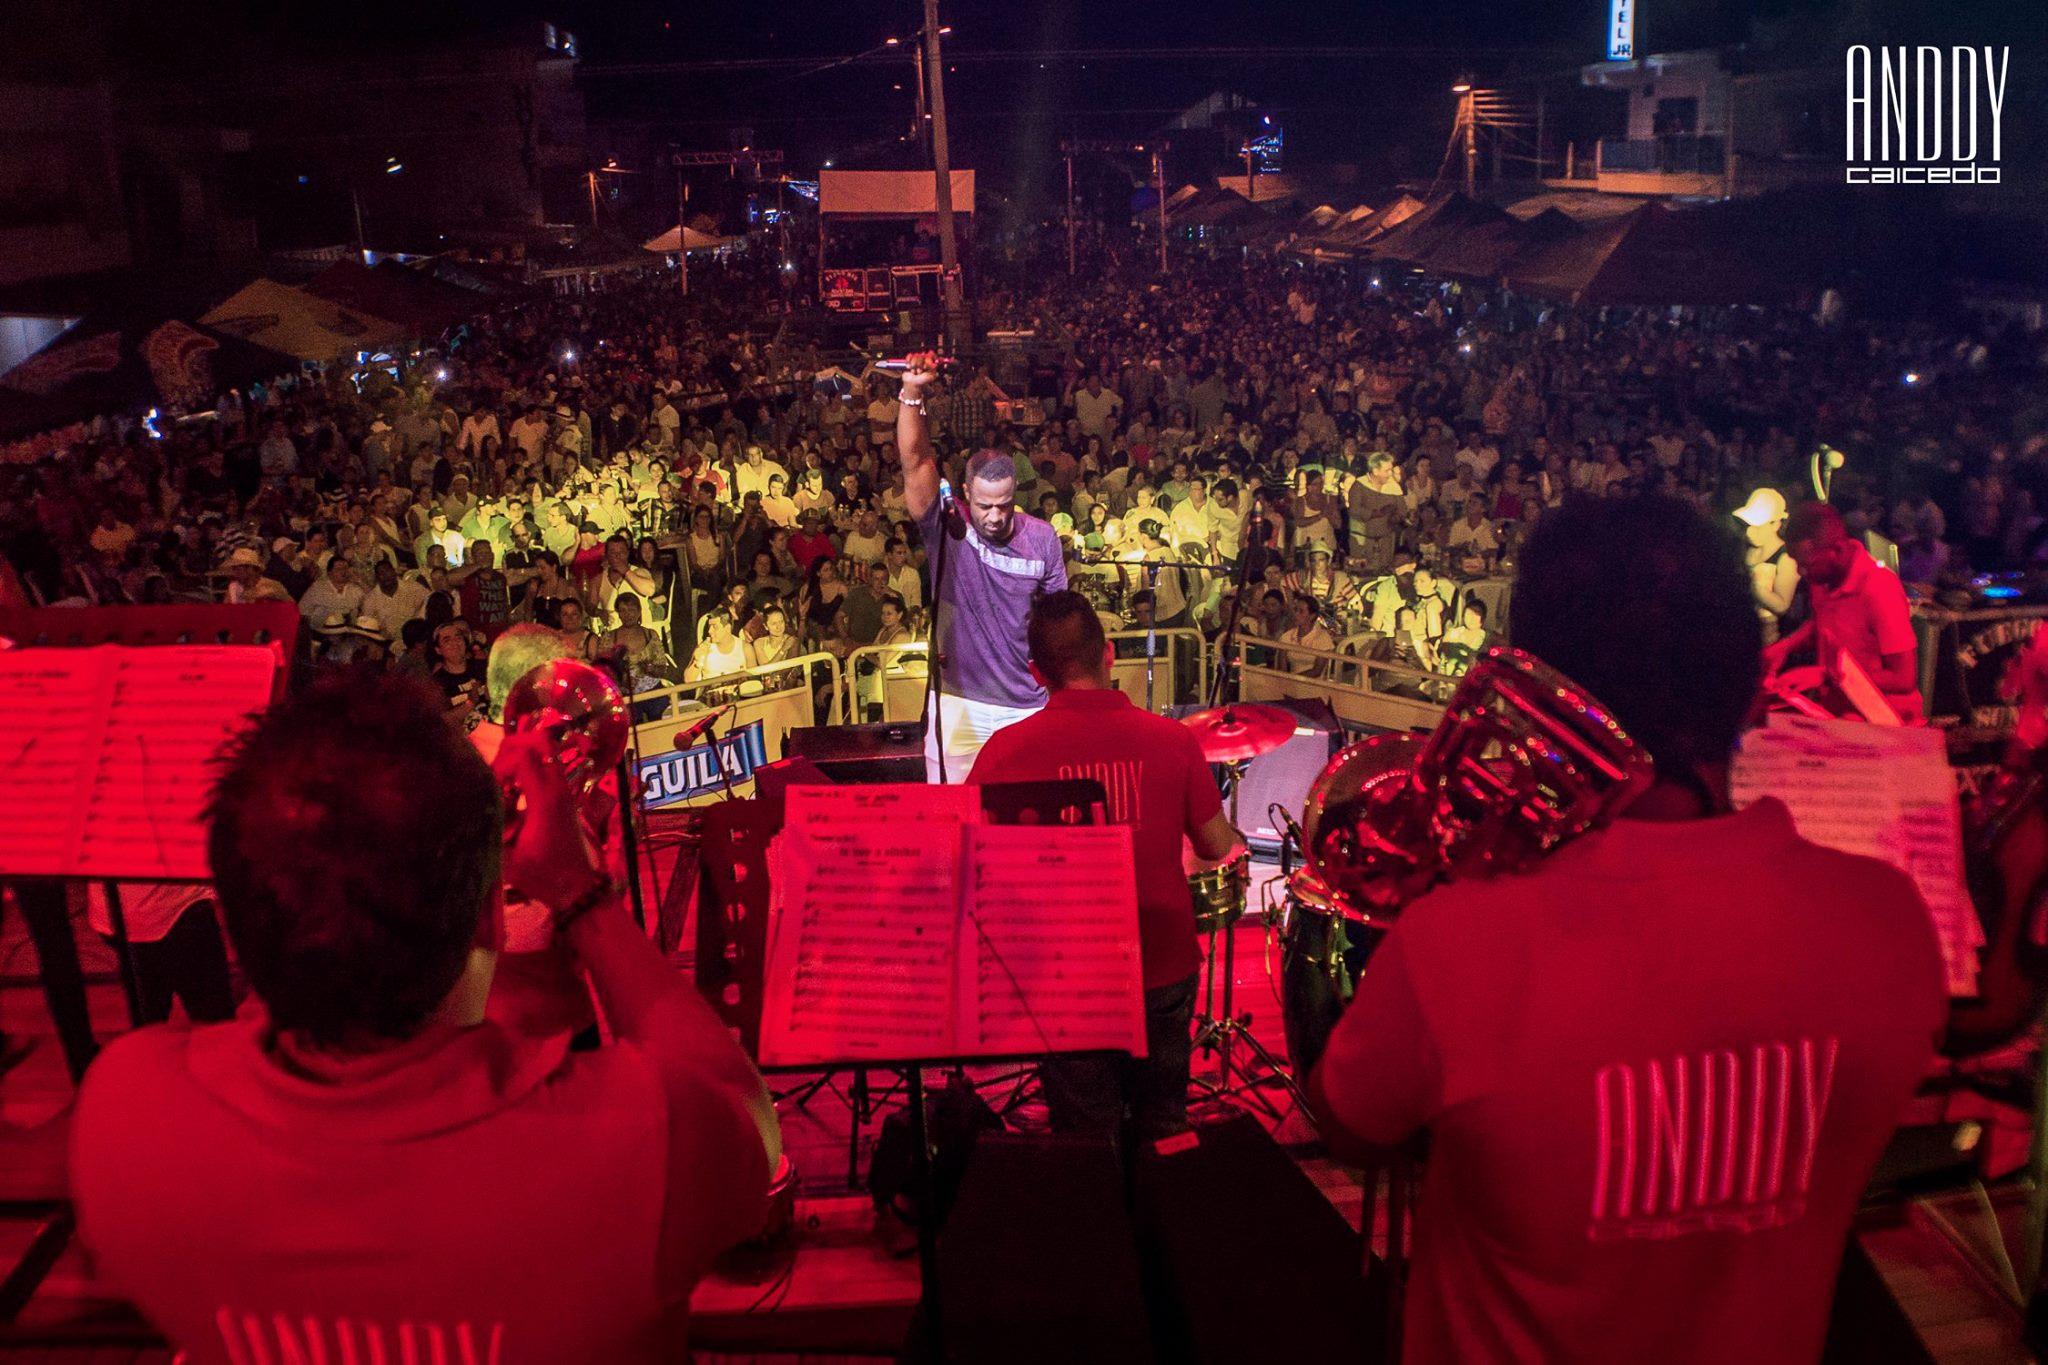 Grupo de salsa para eventos Anddy Caicedo